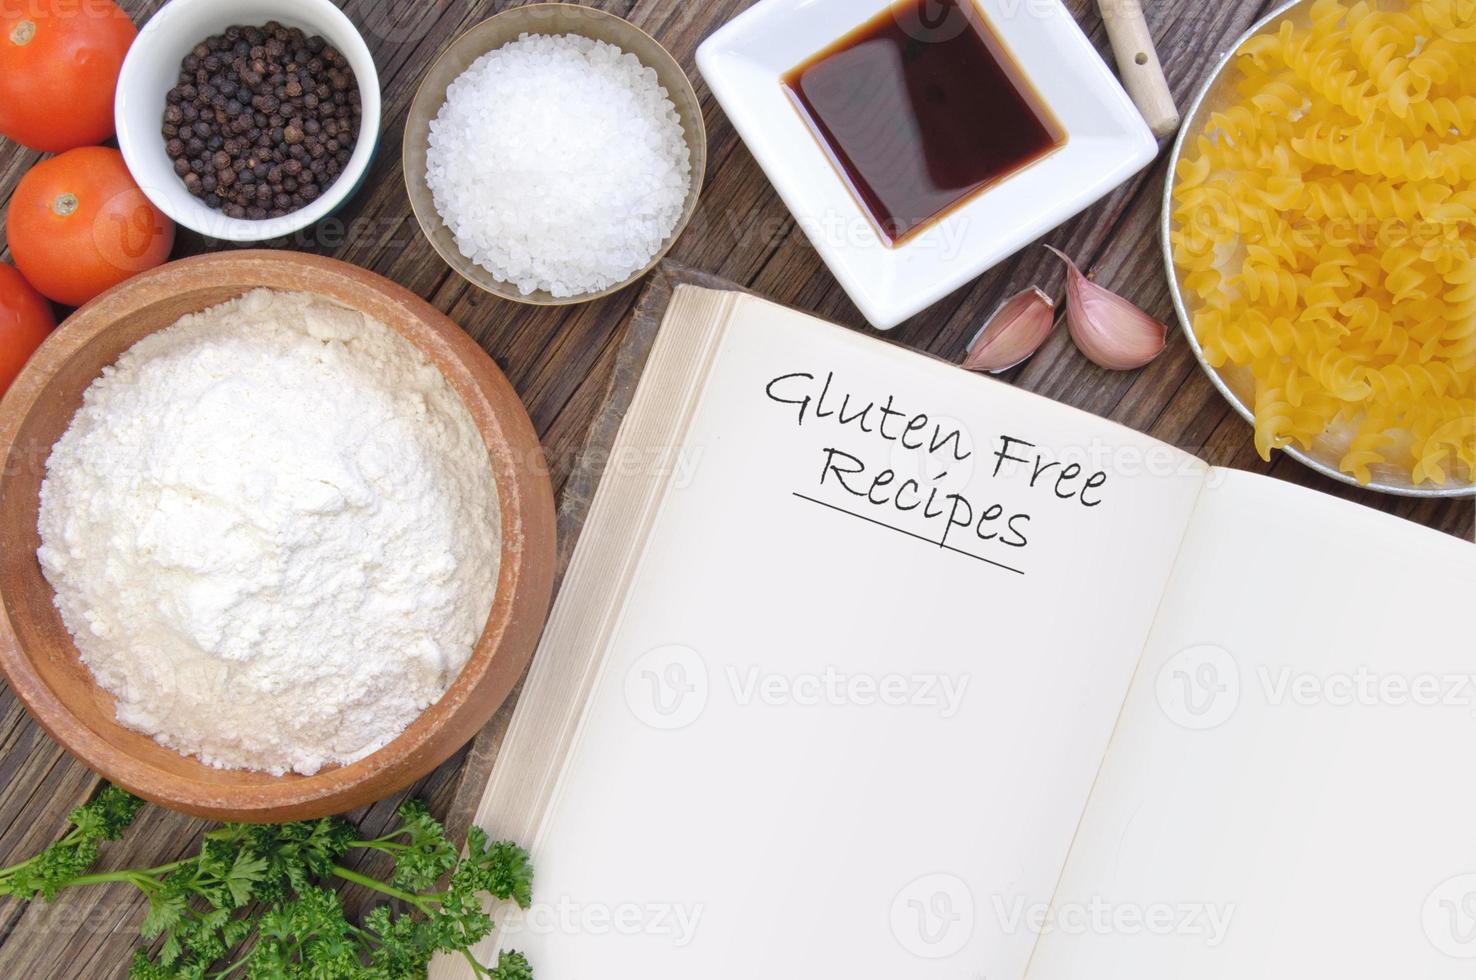 glutenfritt recept foto